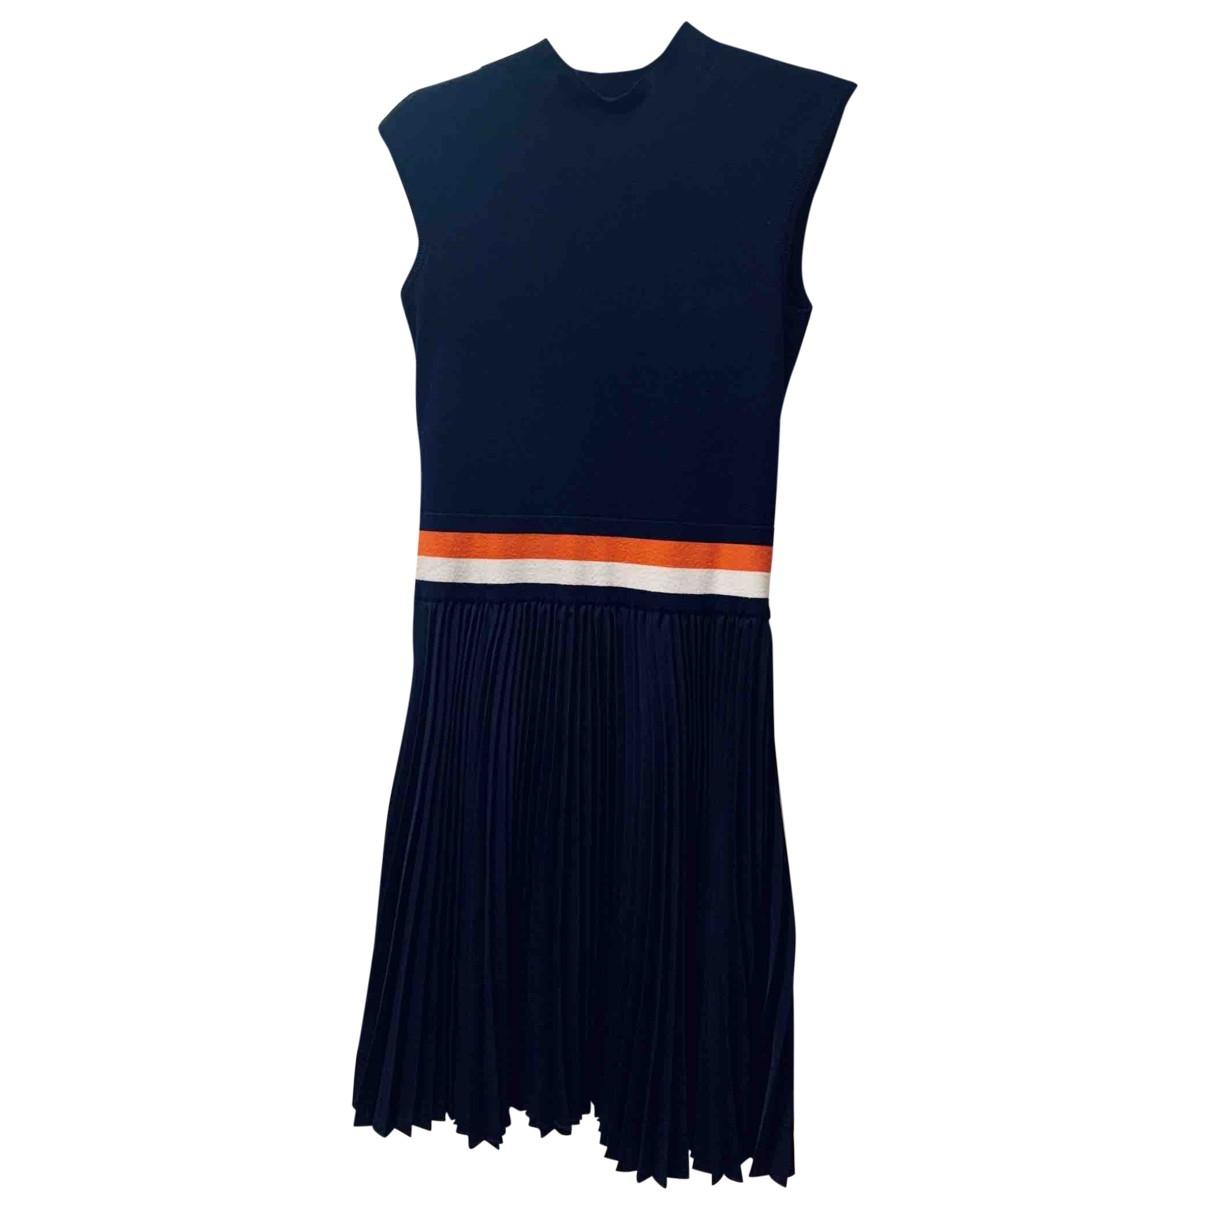 Karen Millen \N Kleid in  Marine Viskose